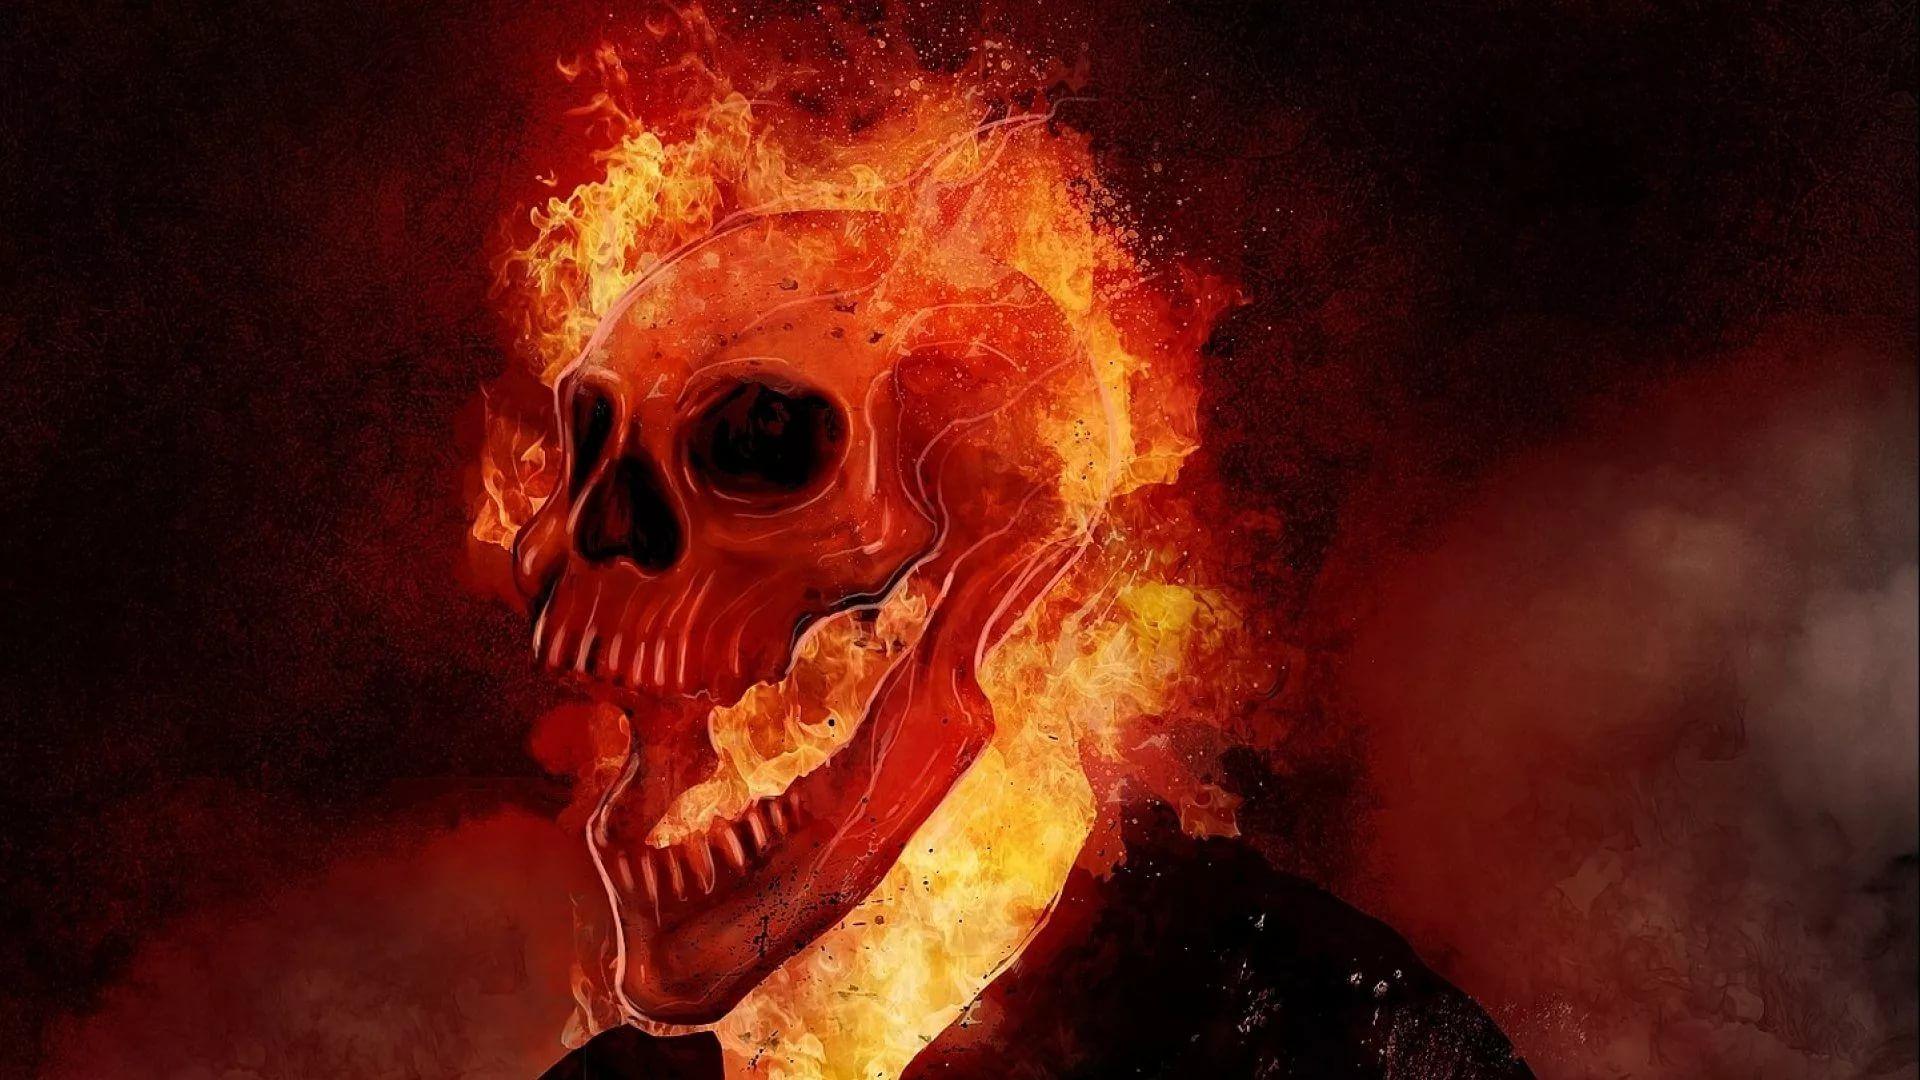 Flaming Skull download nice wallpaper